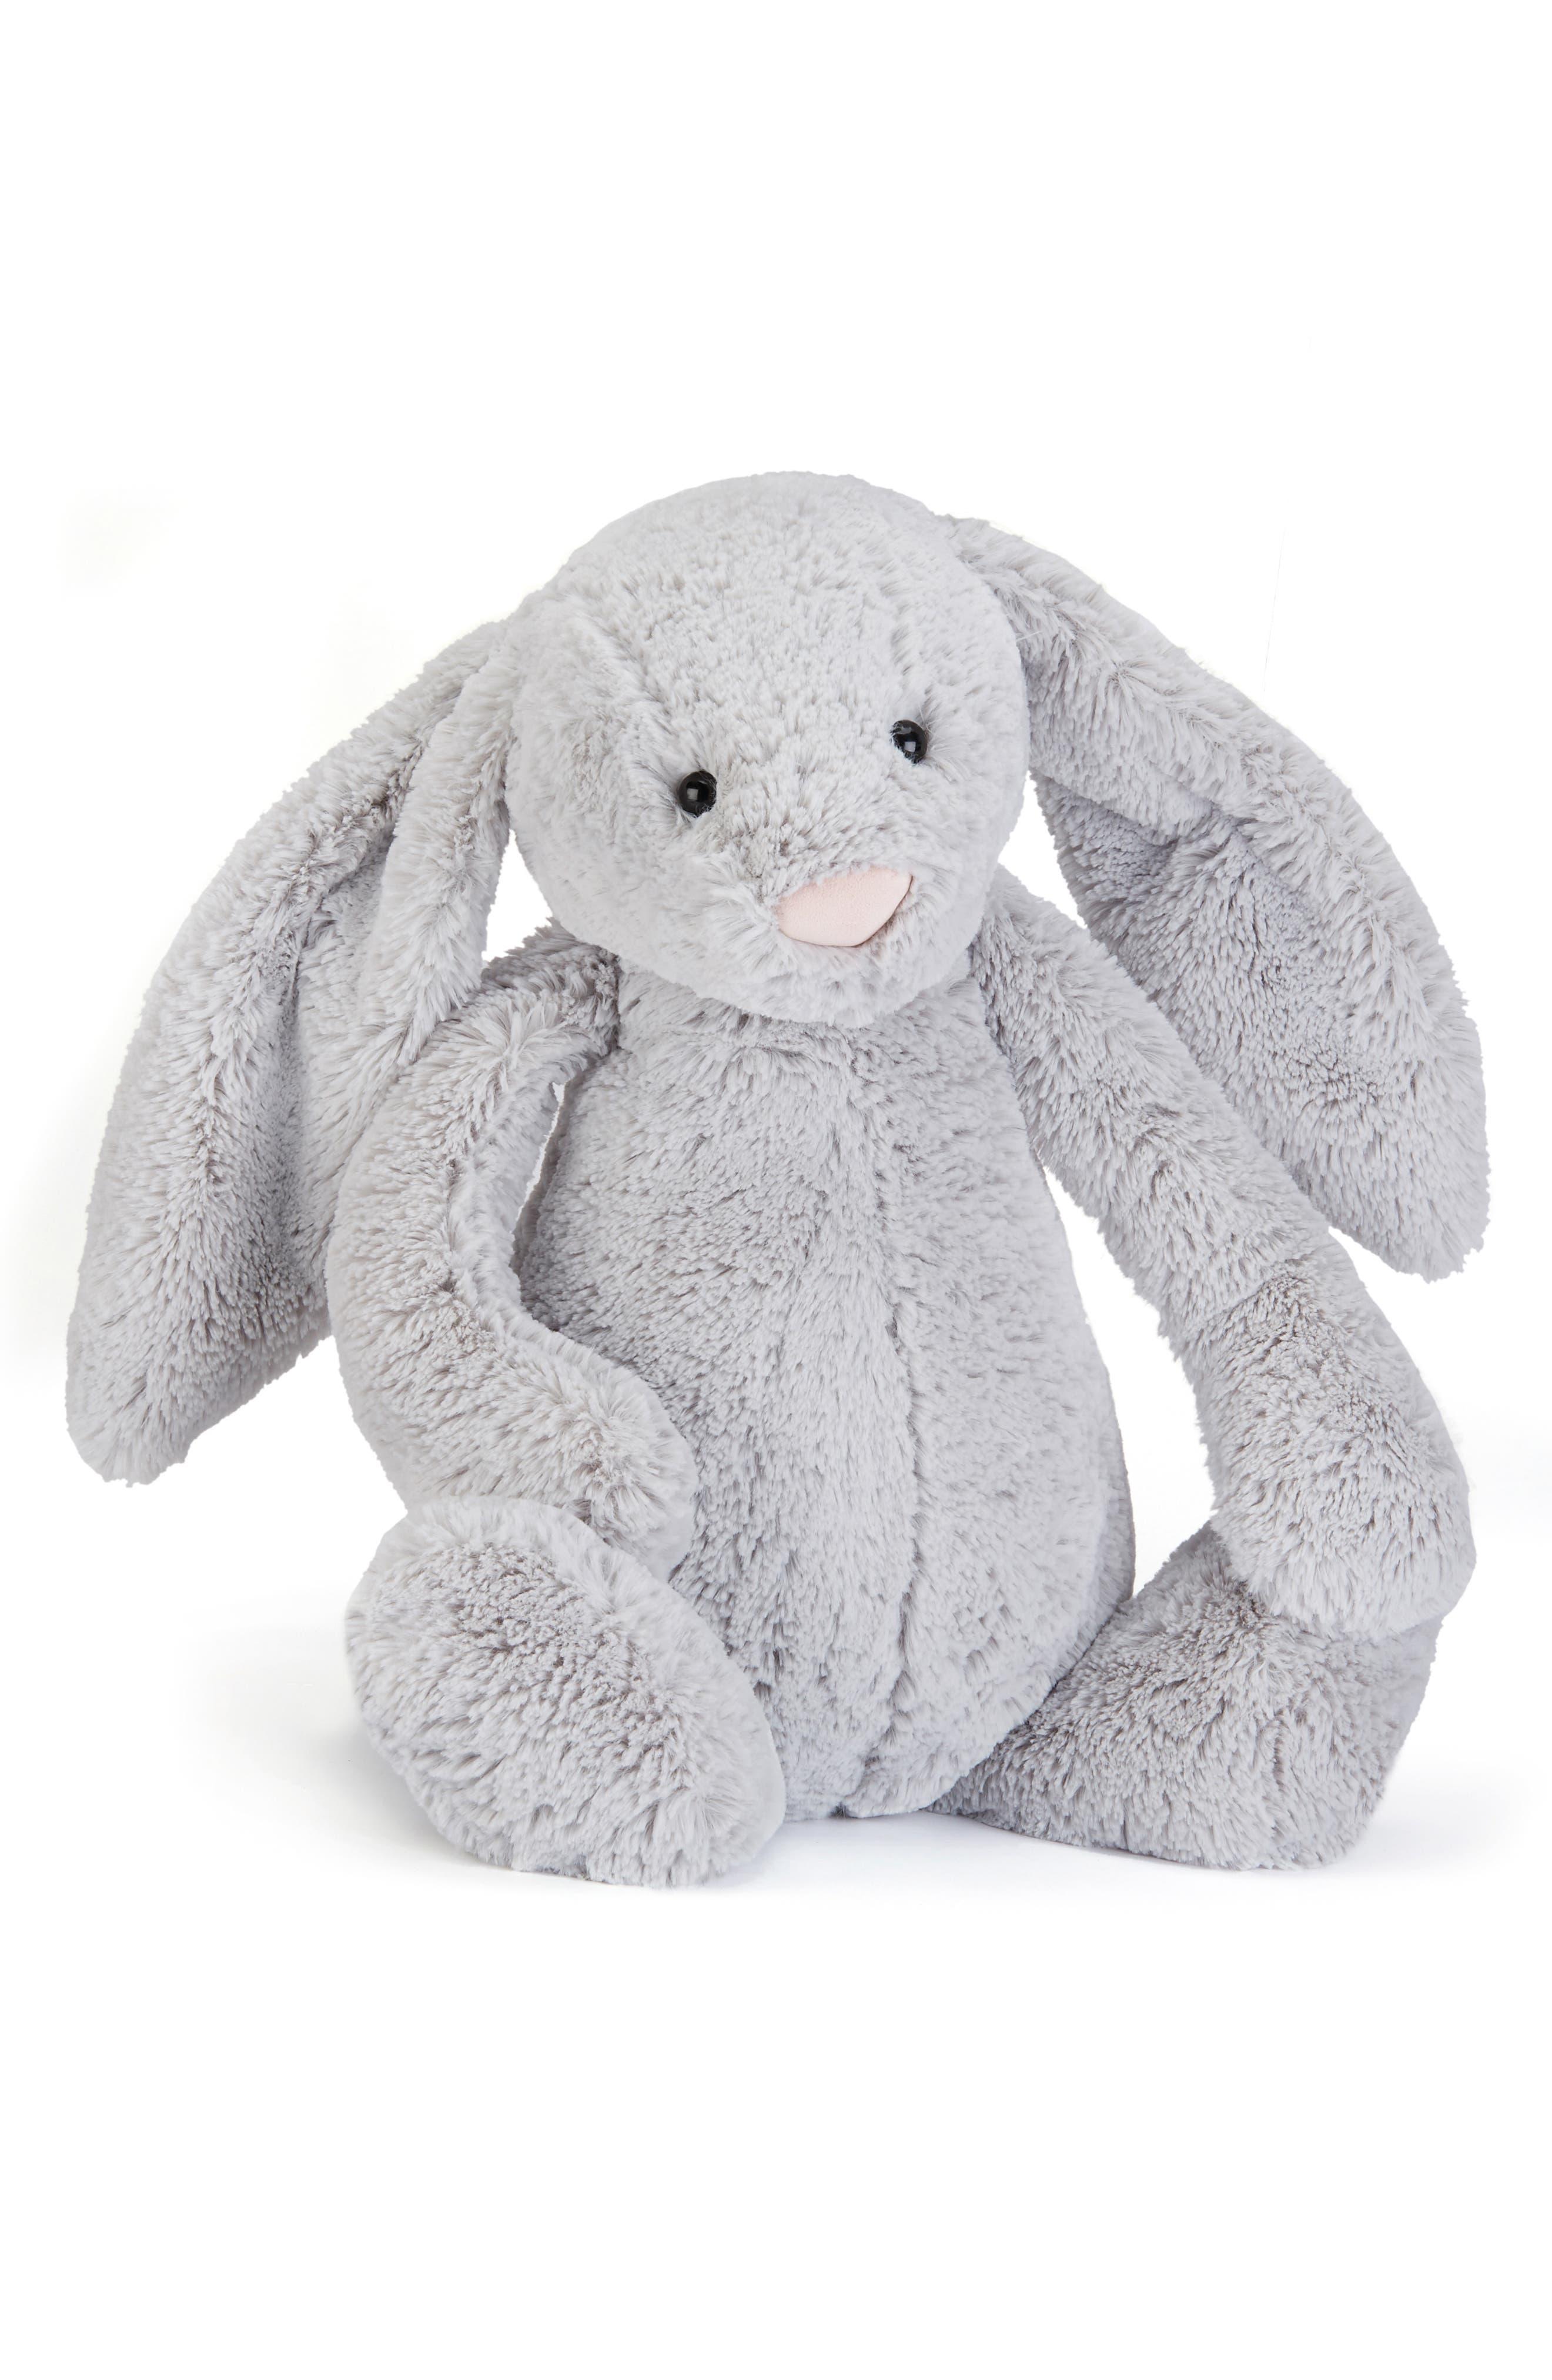 Main Image - Jellycat Bunny Stuffed Animal (21 Inch)